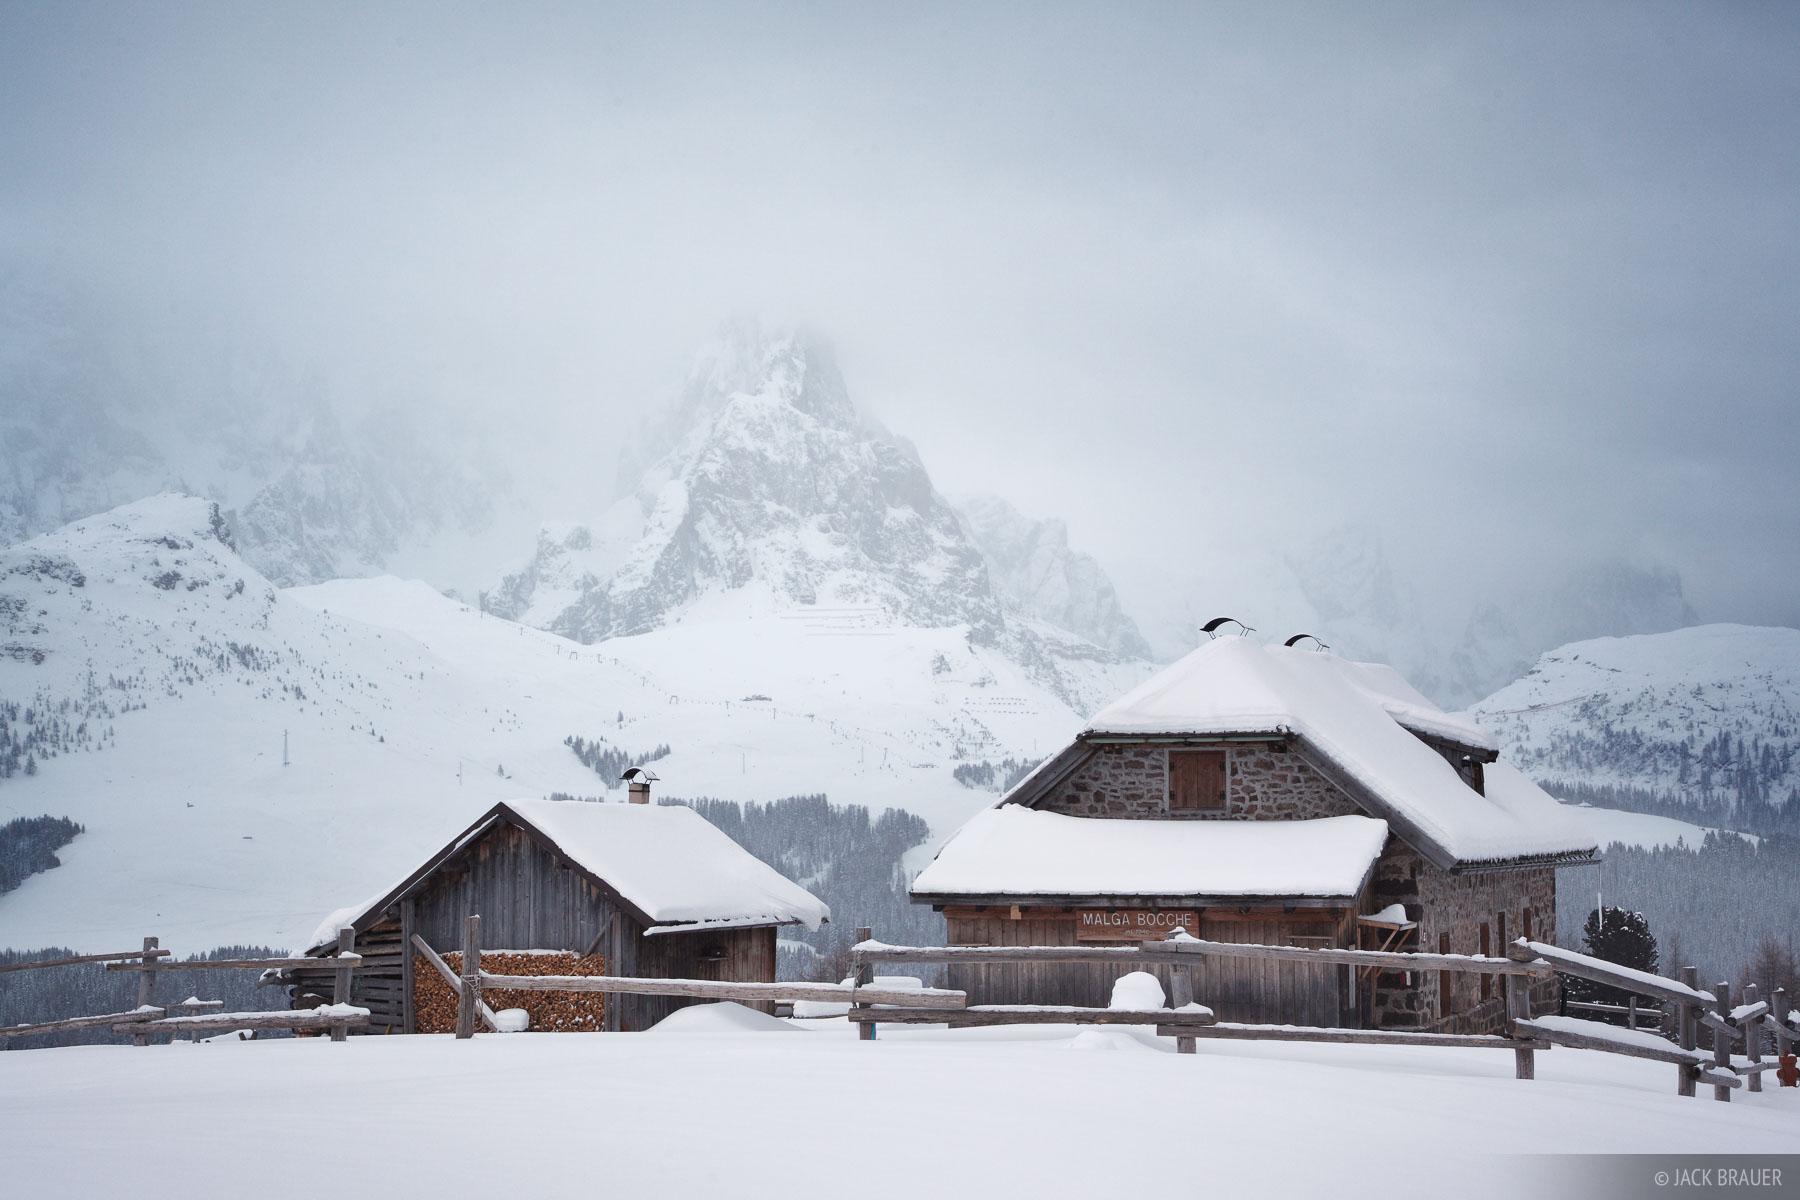 Cimon della Pala, Dolomites,Europe,Italy,San Martino, photo